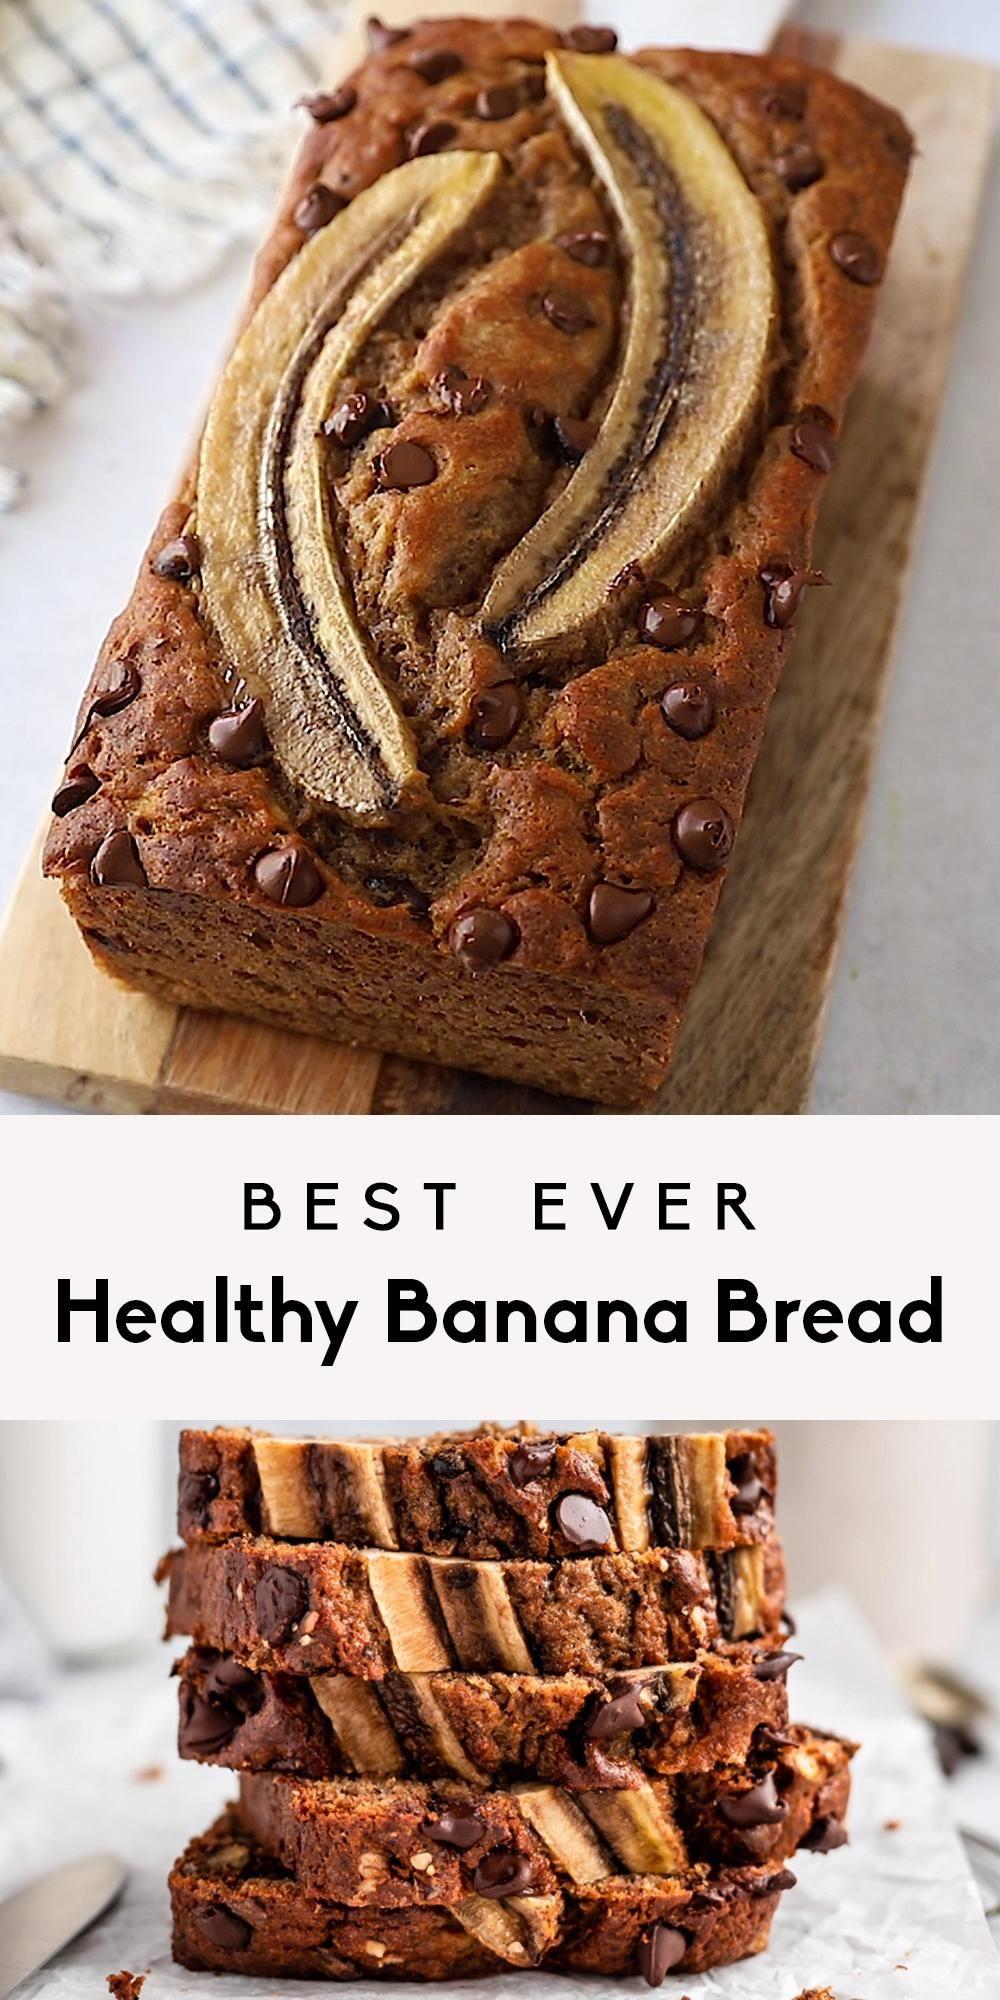 Best Ever Healthy Banana Bread Recipe